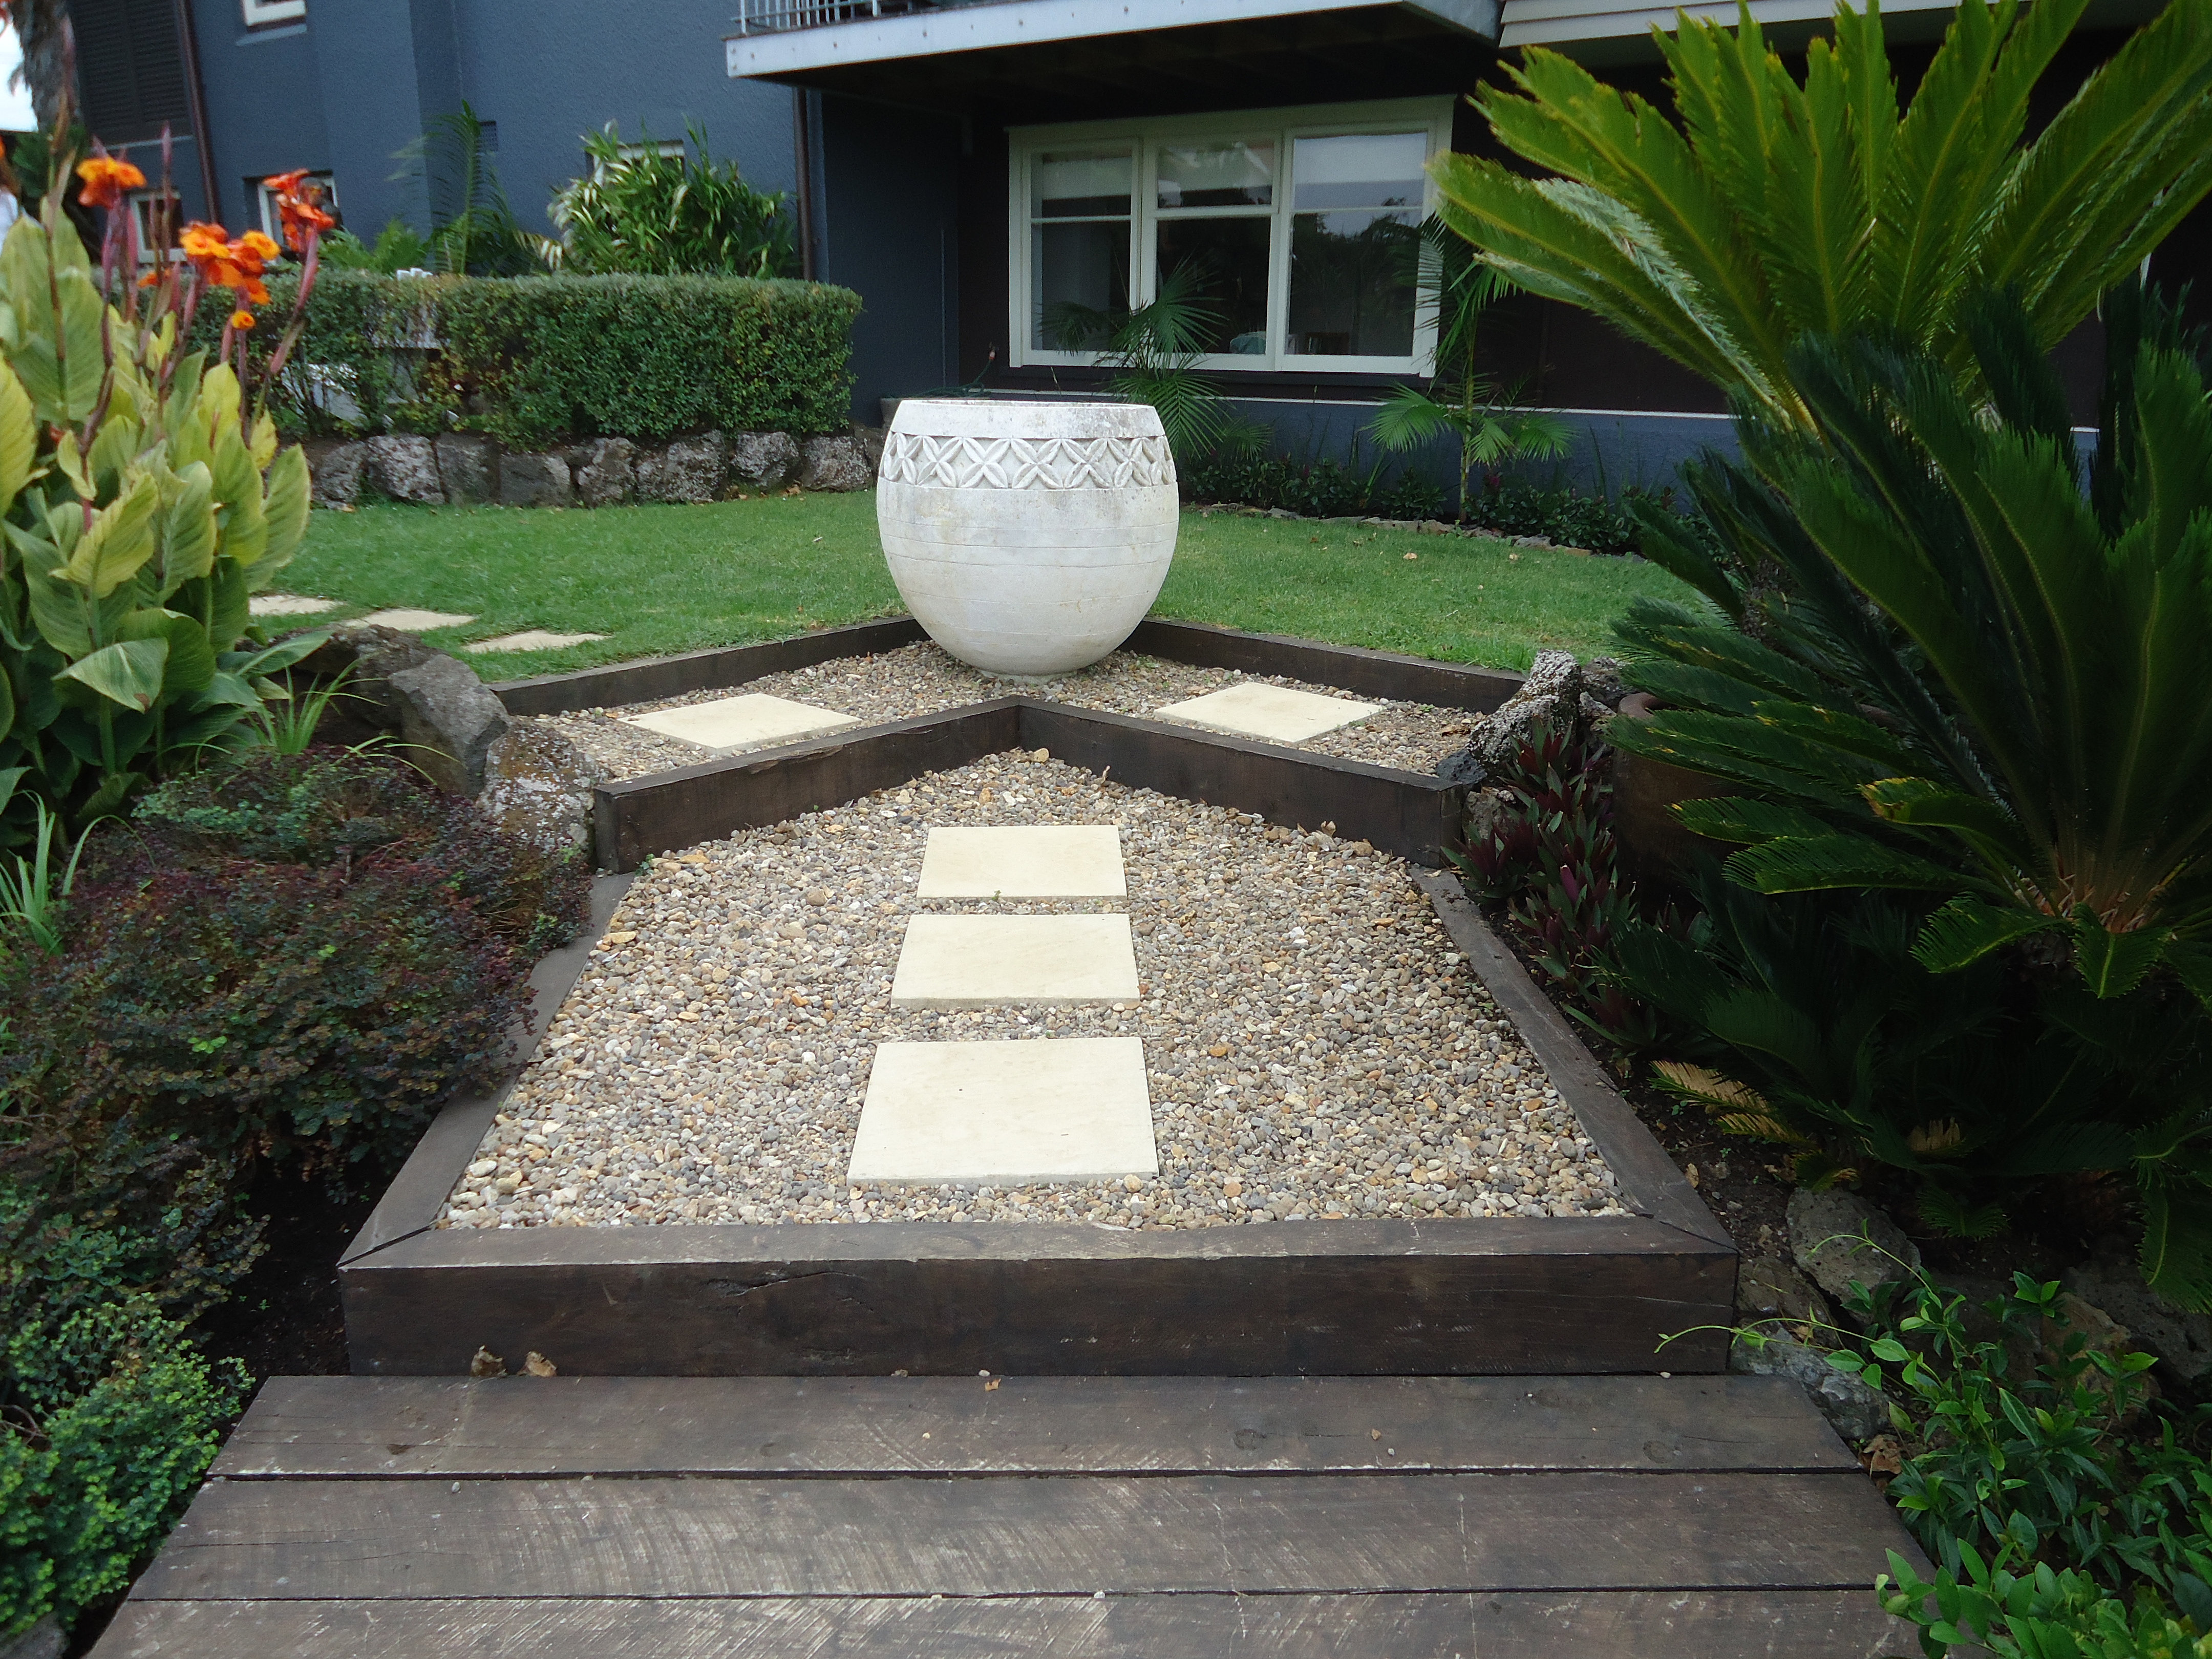 Lahood landscapes landscaping services landscaping for Auckland landscaping services